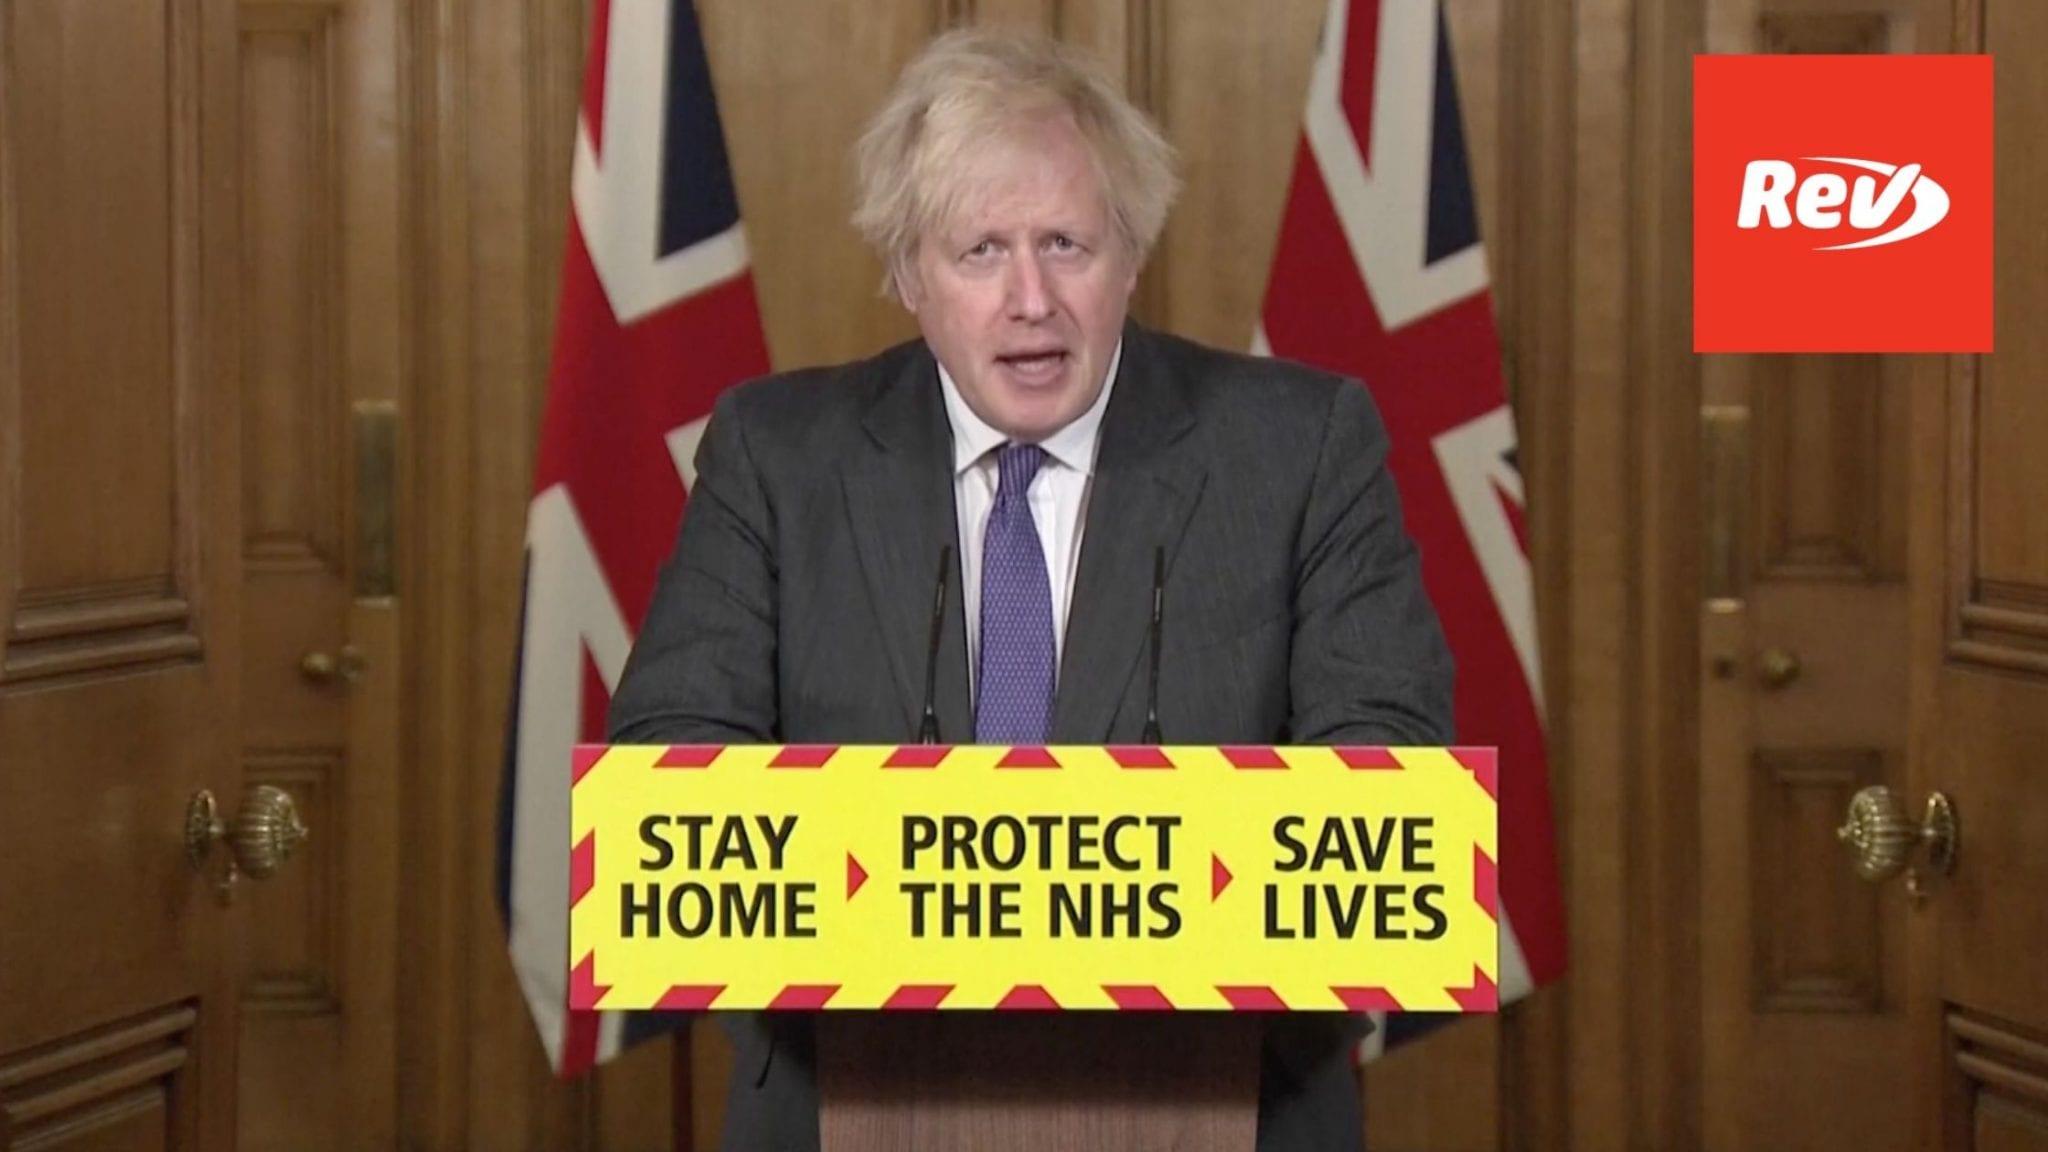 Boris Johnson COVID Press Conference Transcript January 22: Update on New Variant